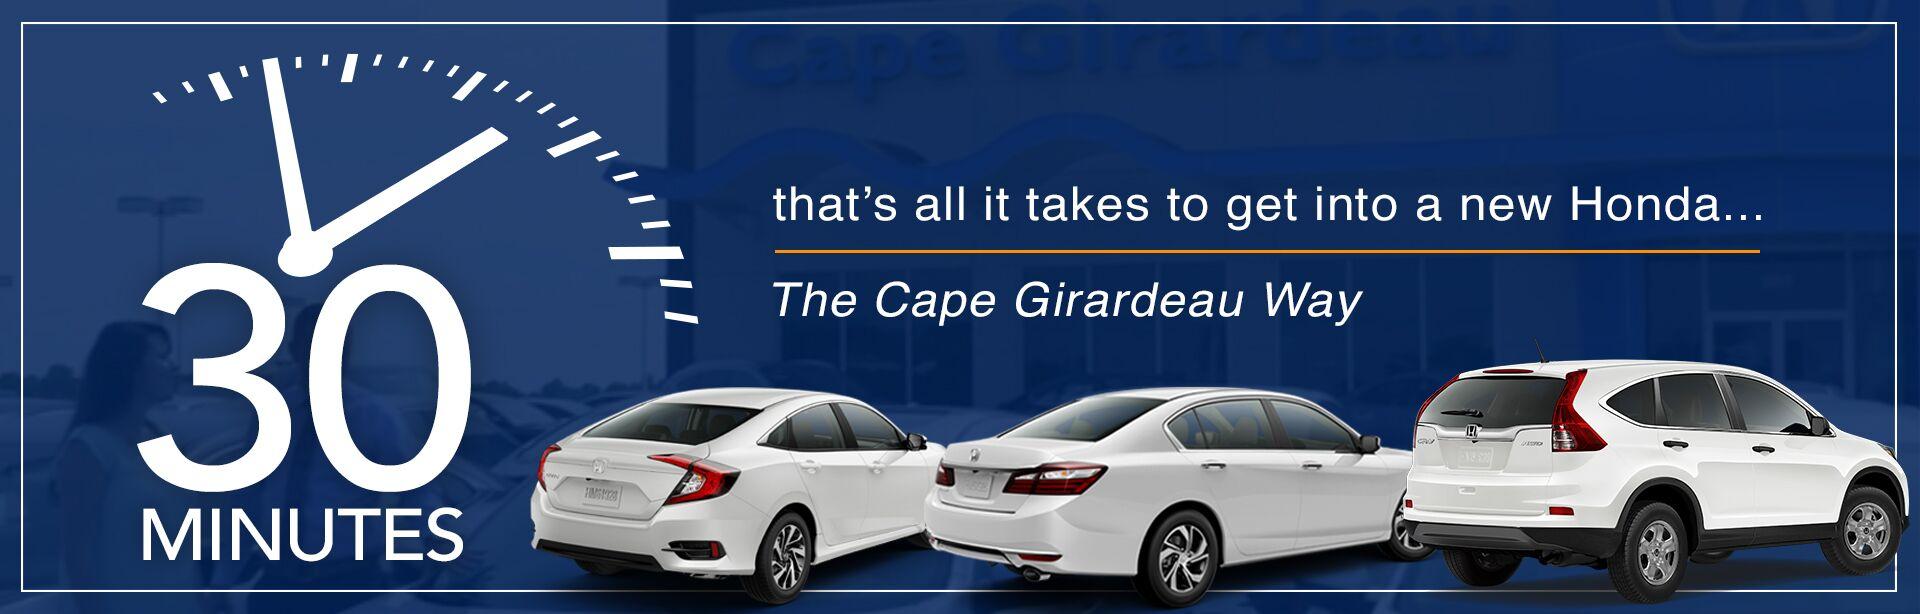 Honda Car Dealer Cape Girardeau Mo